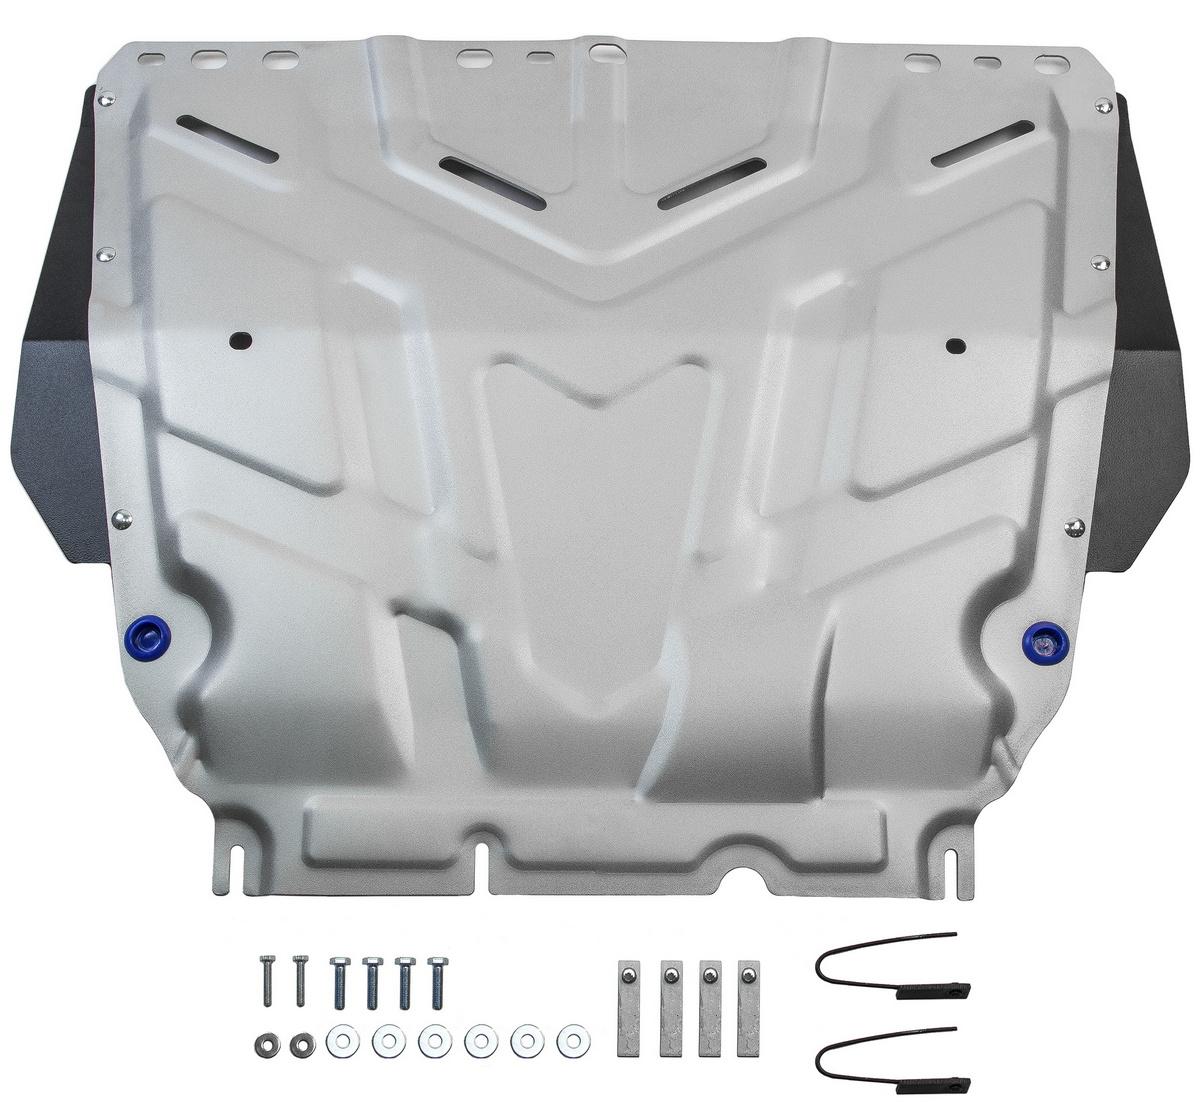 Защита картера и КПП Rival Ford C-MAX/Focus 05-19/Grand C-MAX 10-15/Kuga 08-13, 333.1850.1